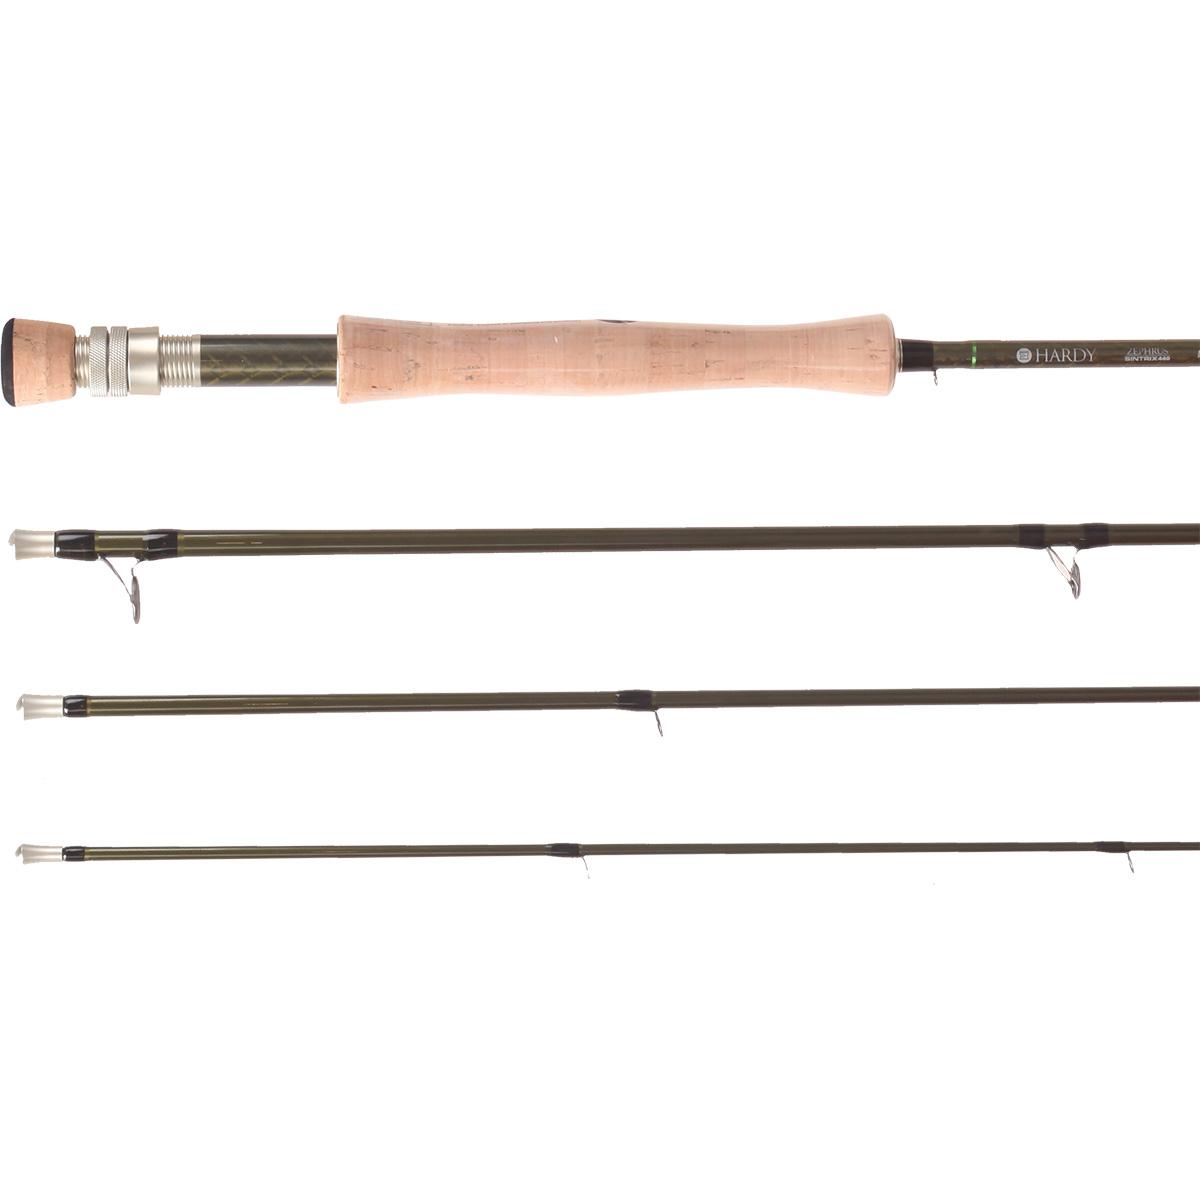 Hardy zephrus aws fly fishing rods ebay for Ebay fly fishing